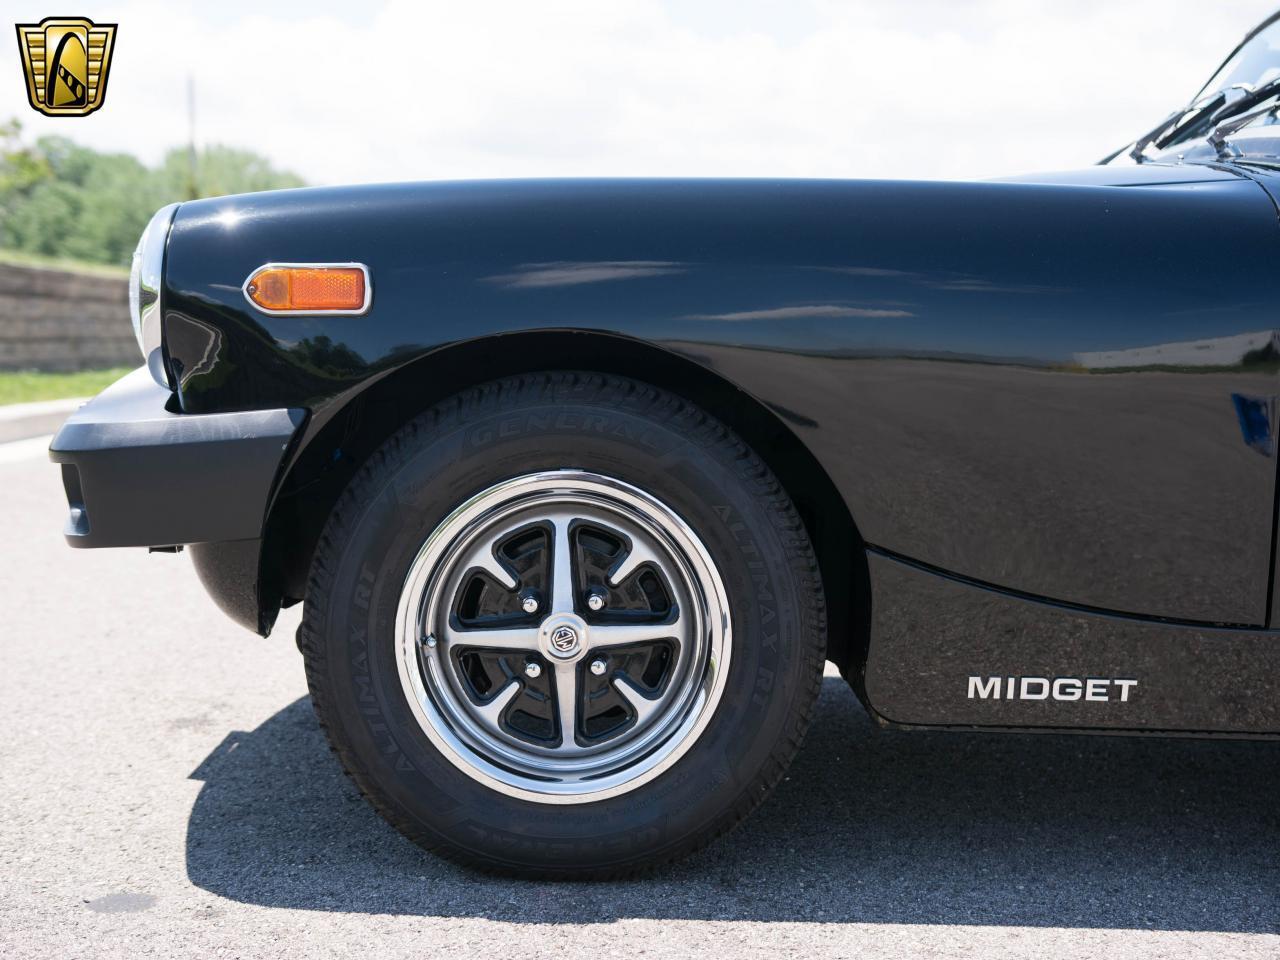 Large Picture of '77 Midget - L6A3